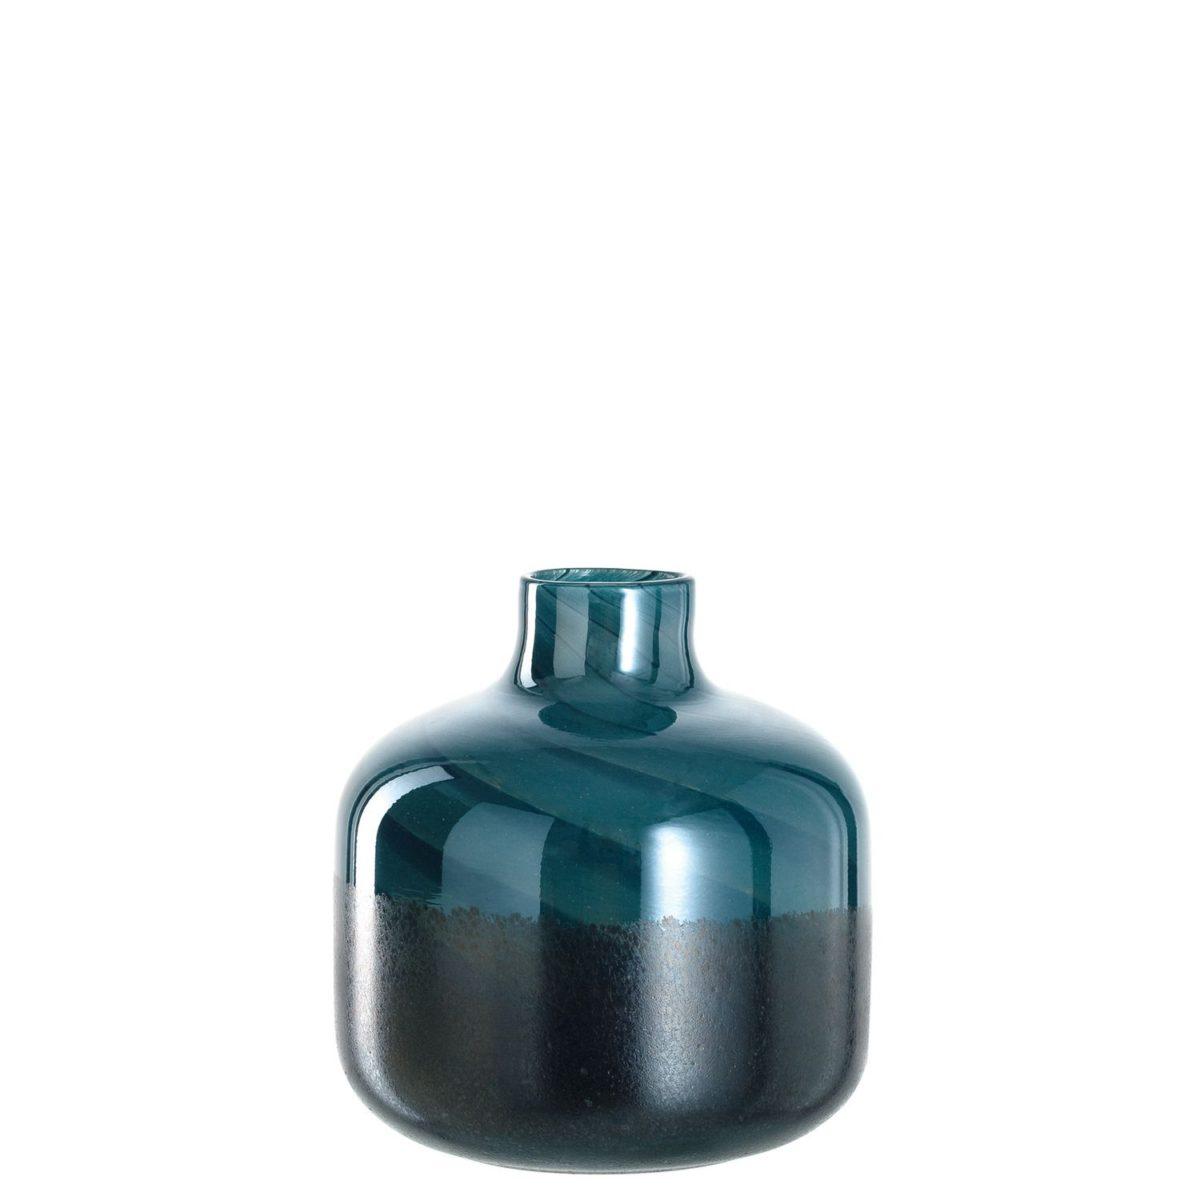 020802 0 k 1200x1200 - Vaza Lucente LEONARDO (L020802)